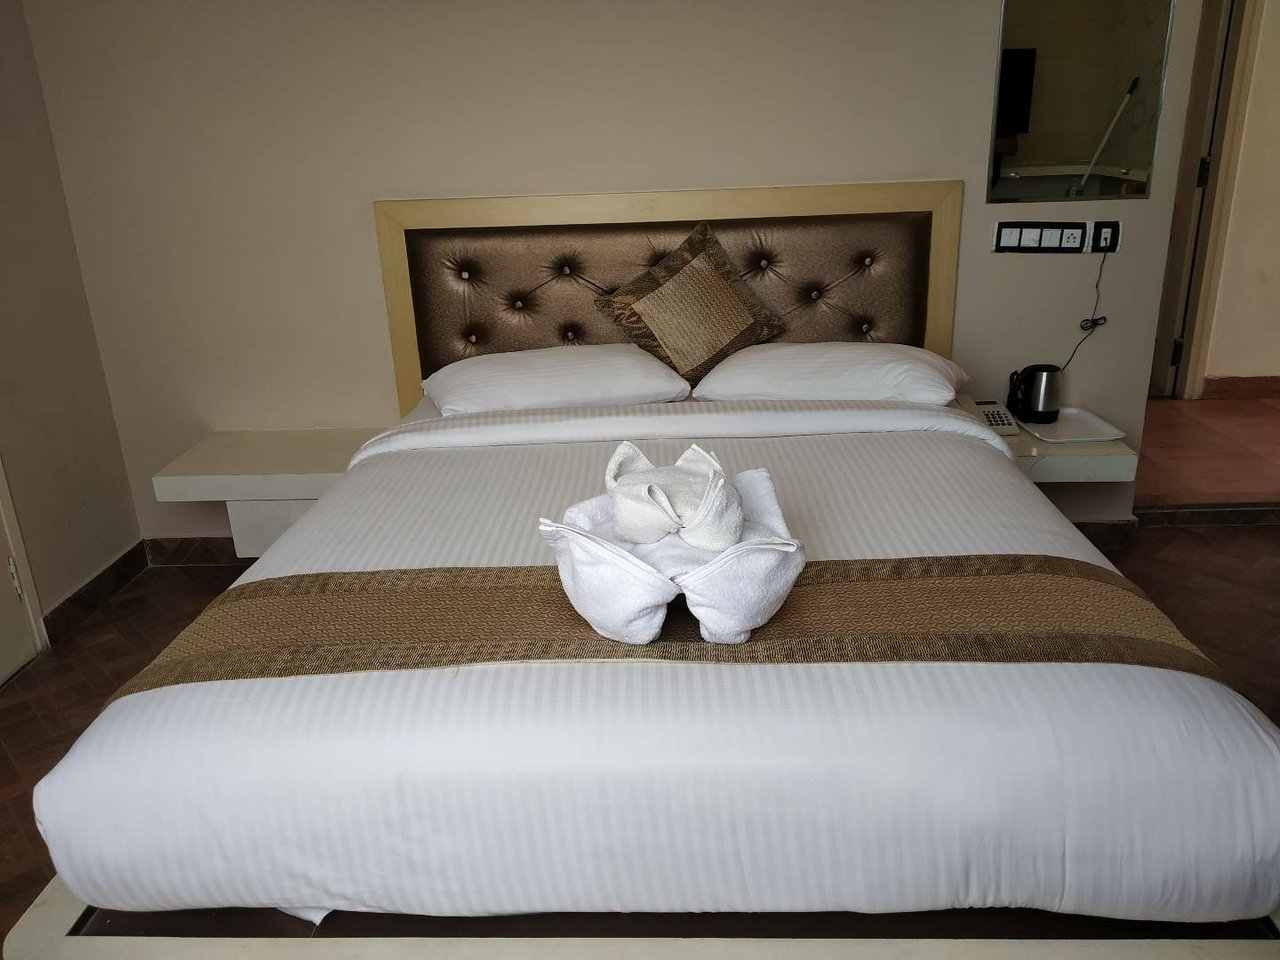 The 10 Best 3 Star Hotels In Koramangala Bengaluru Of 2020